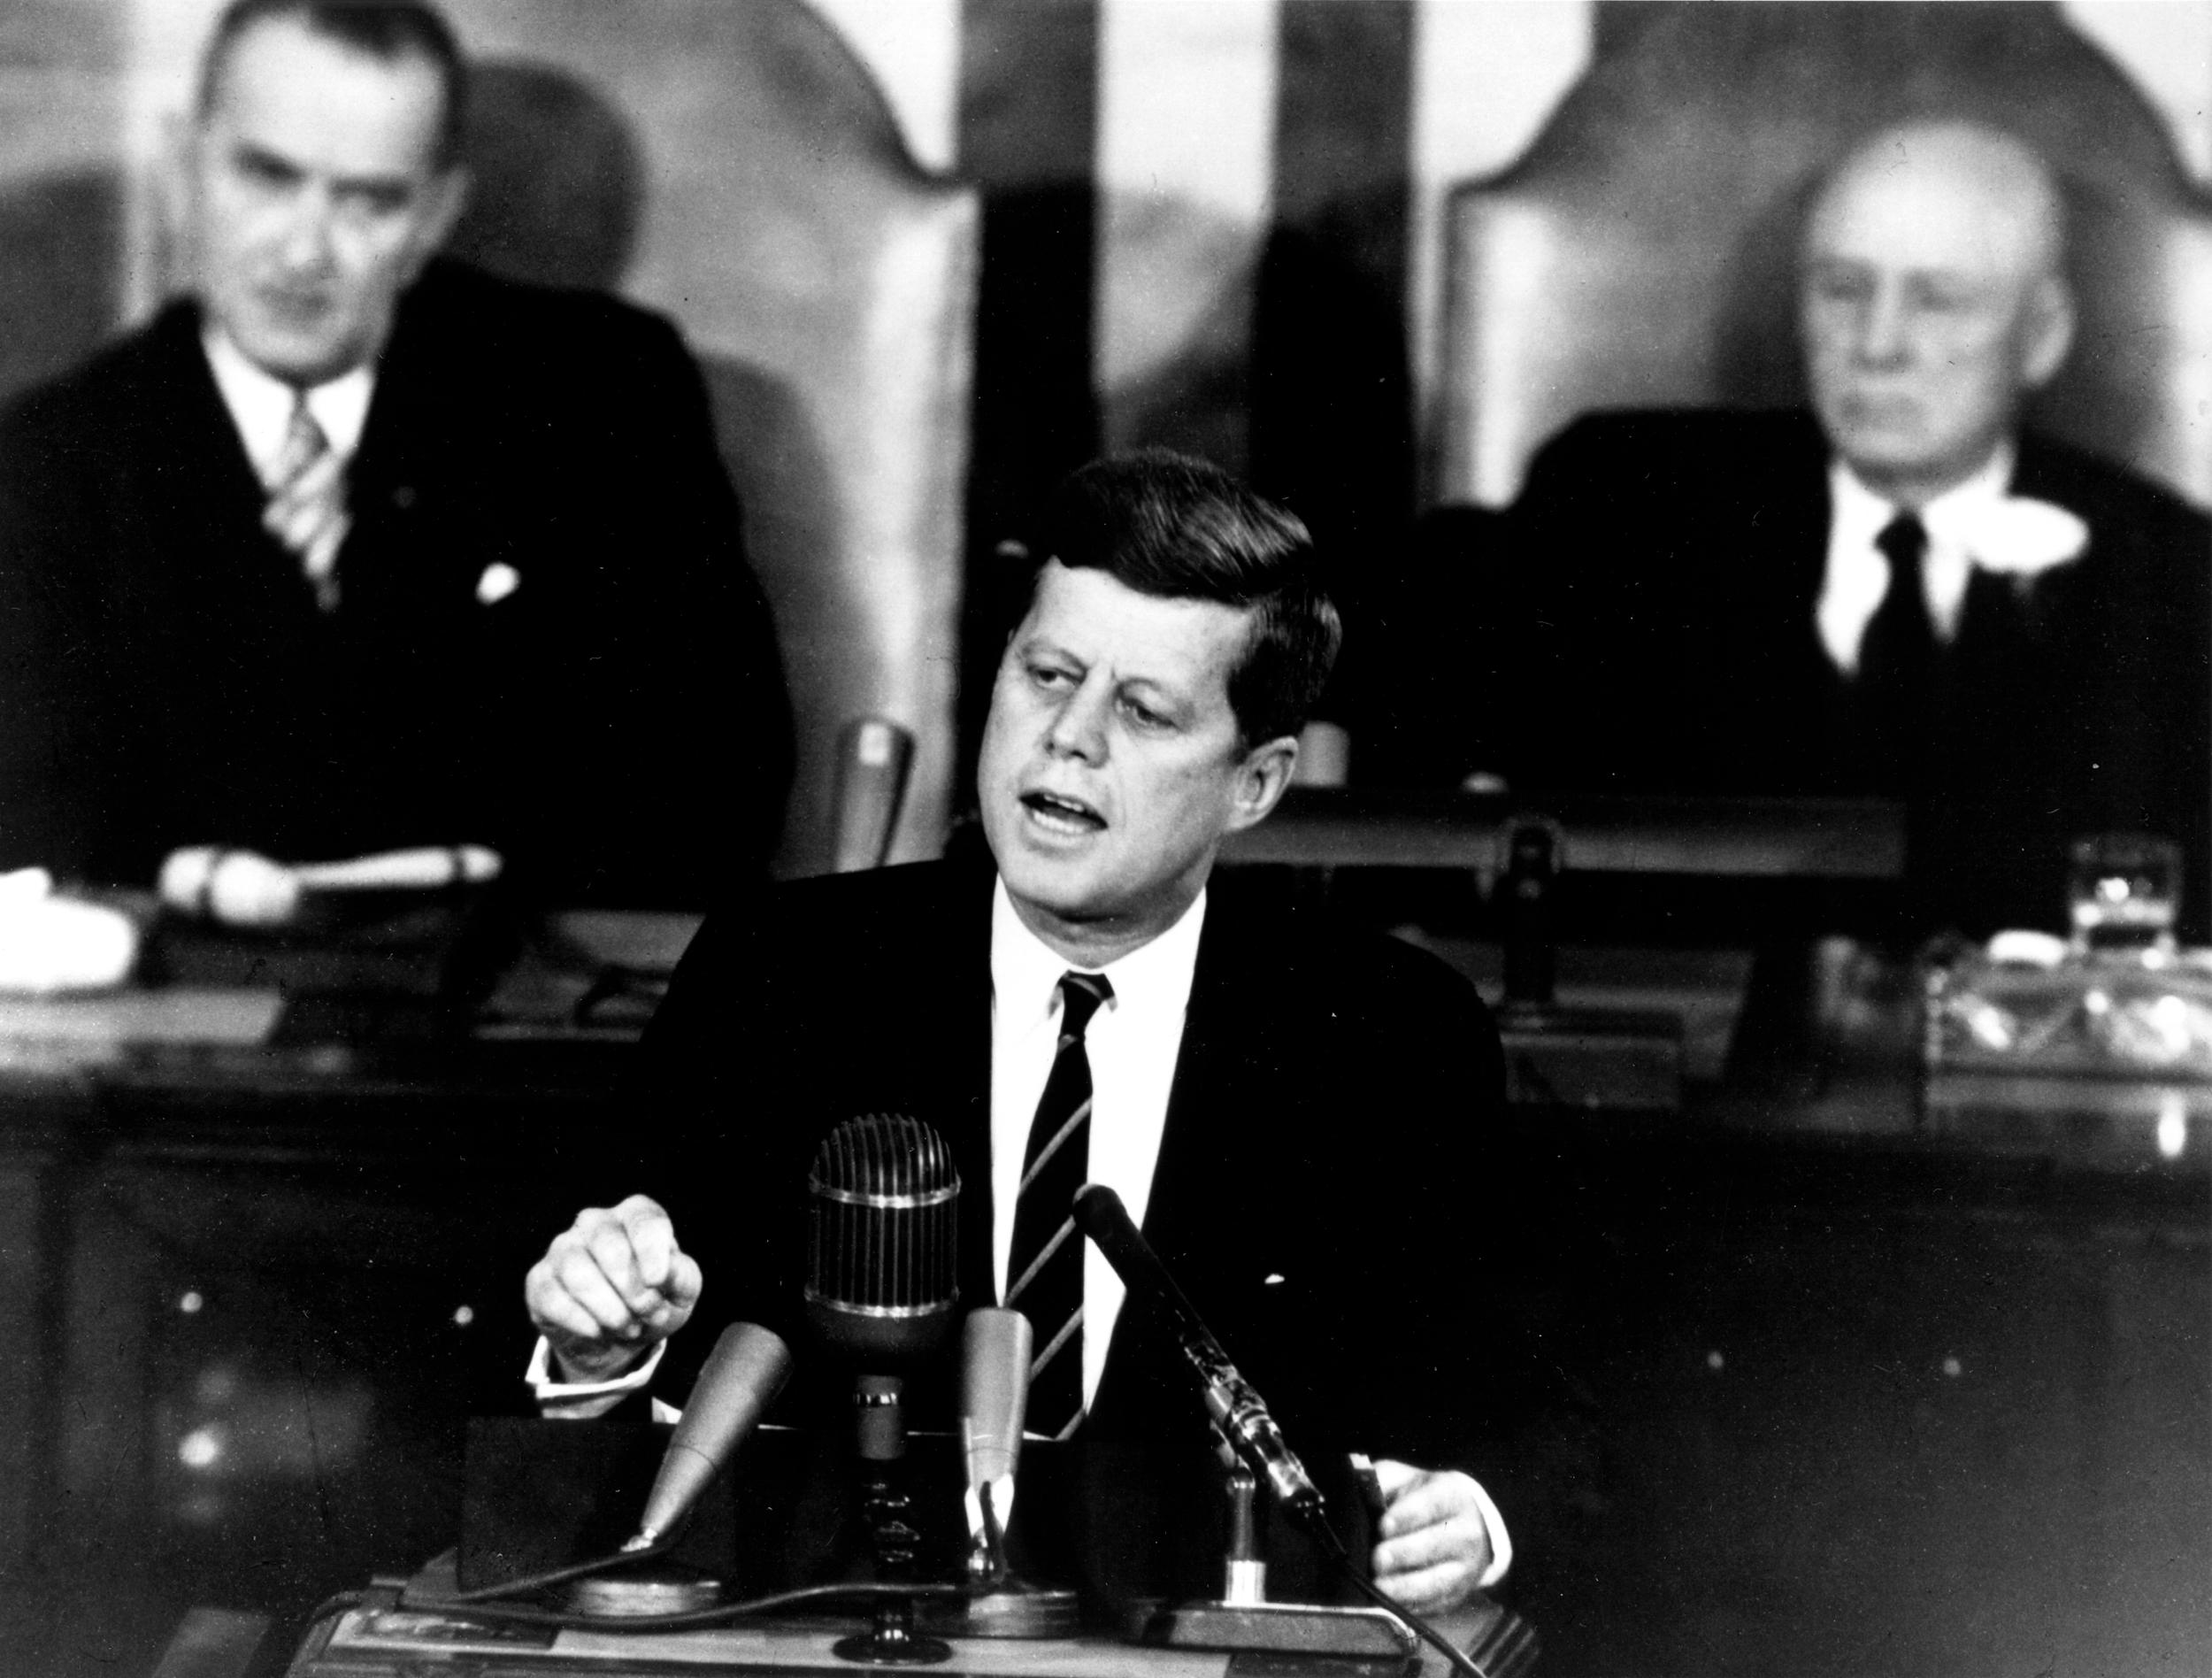 2014-11-27-Kennedy_Giving_Historic_Speech_to_Congress__GPN2000001658.jpg